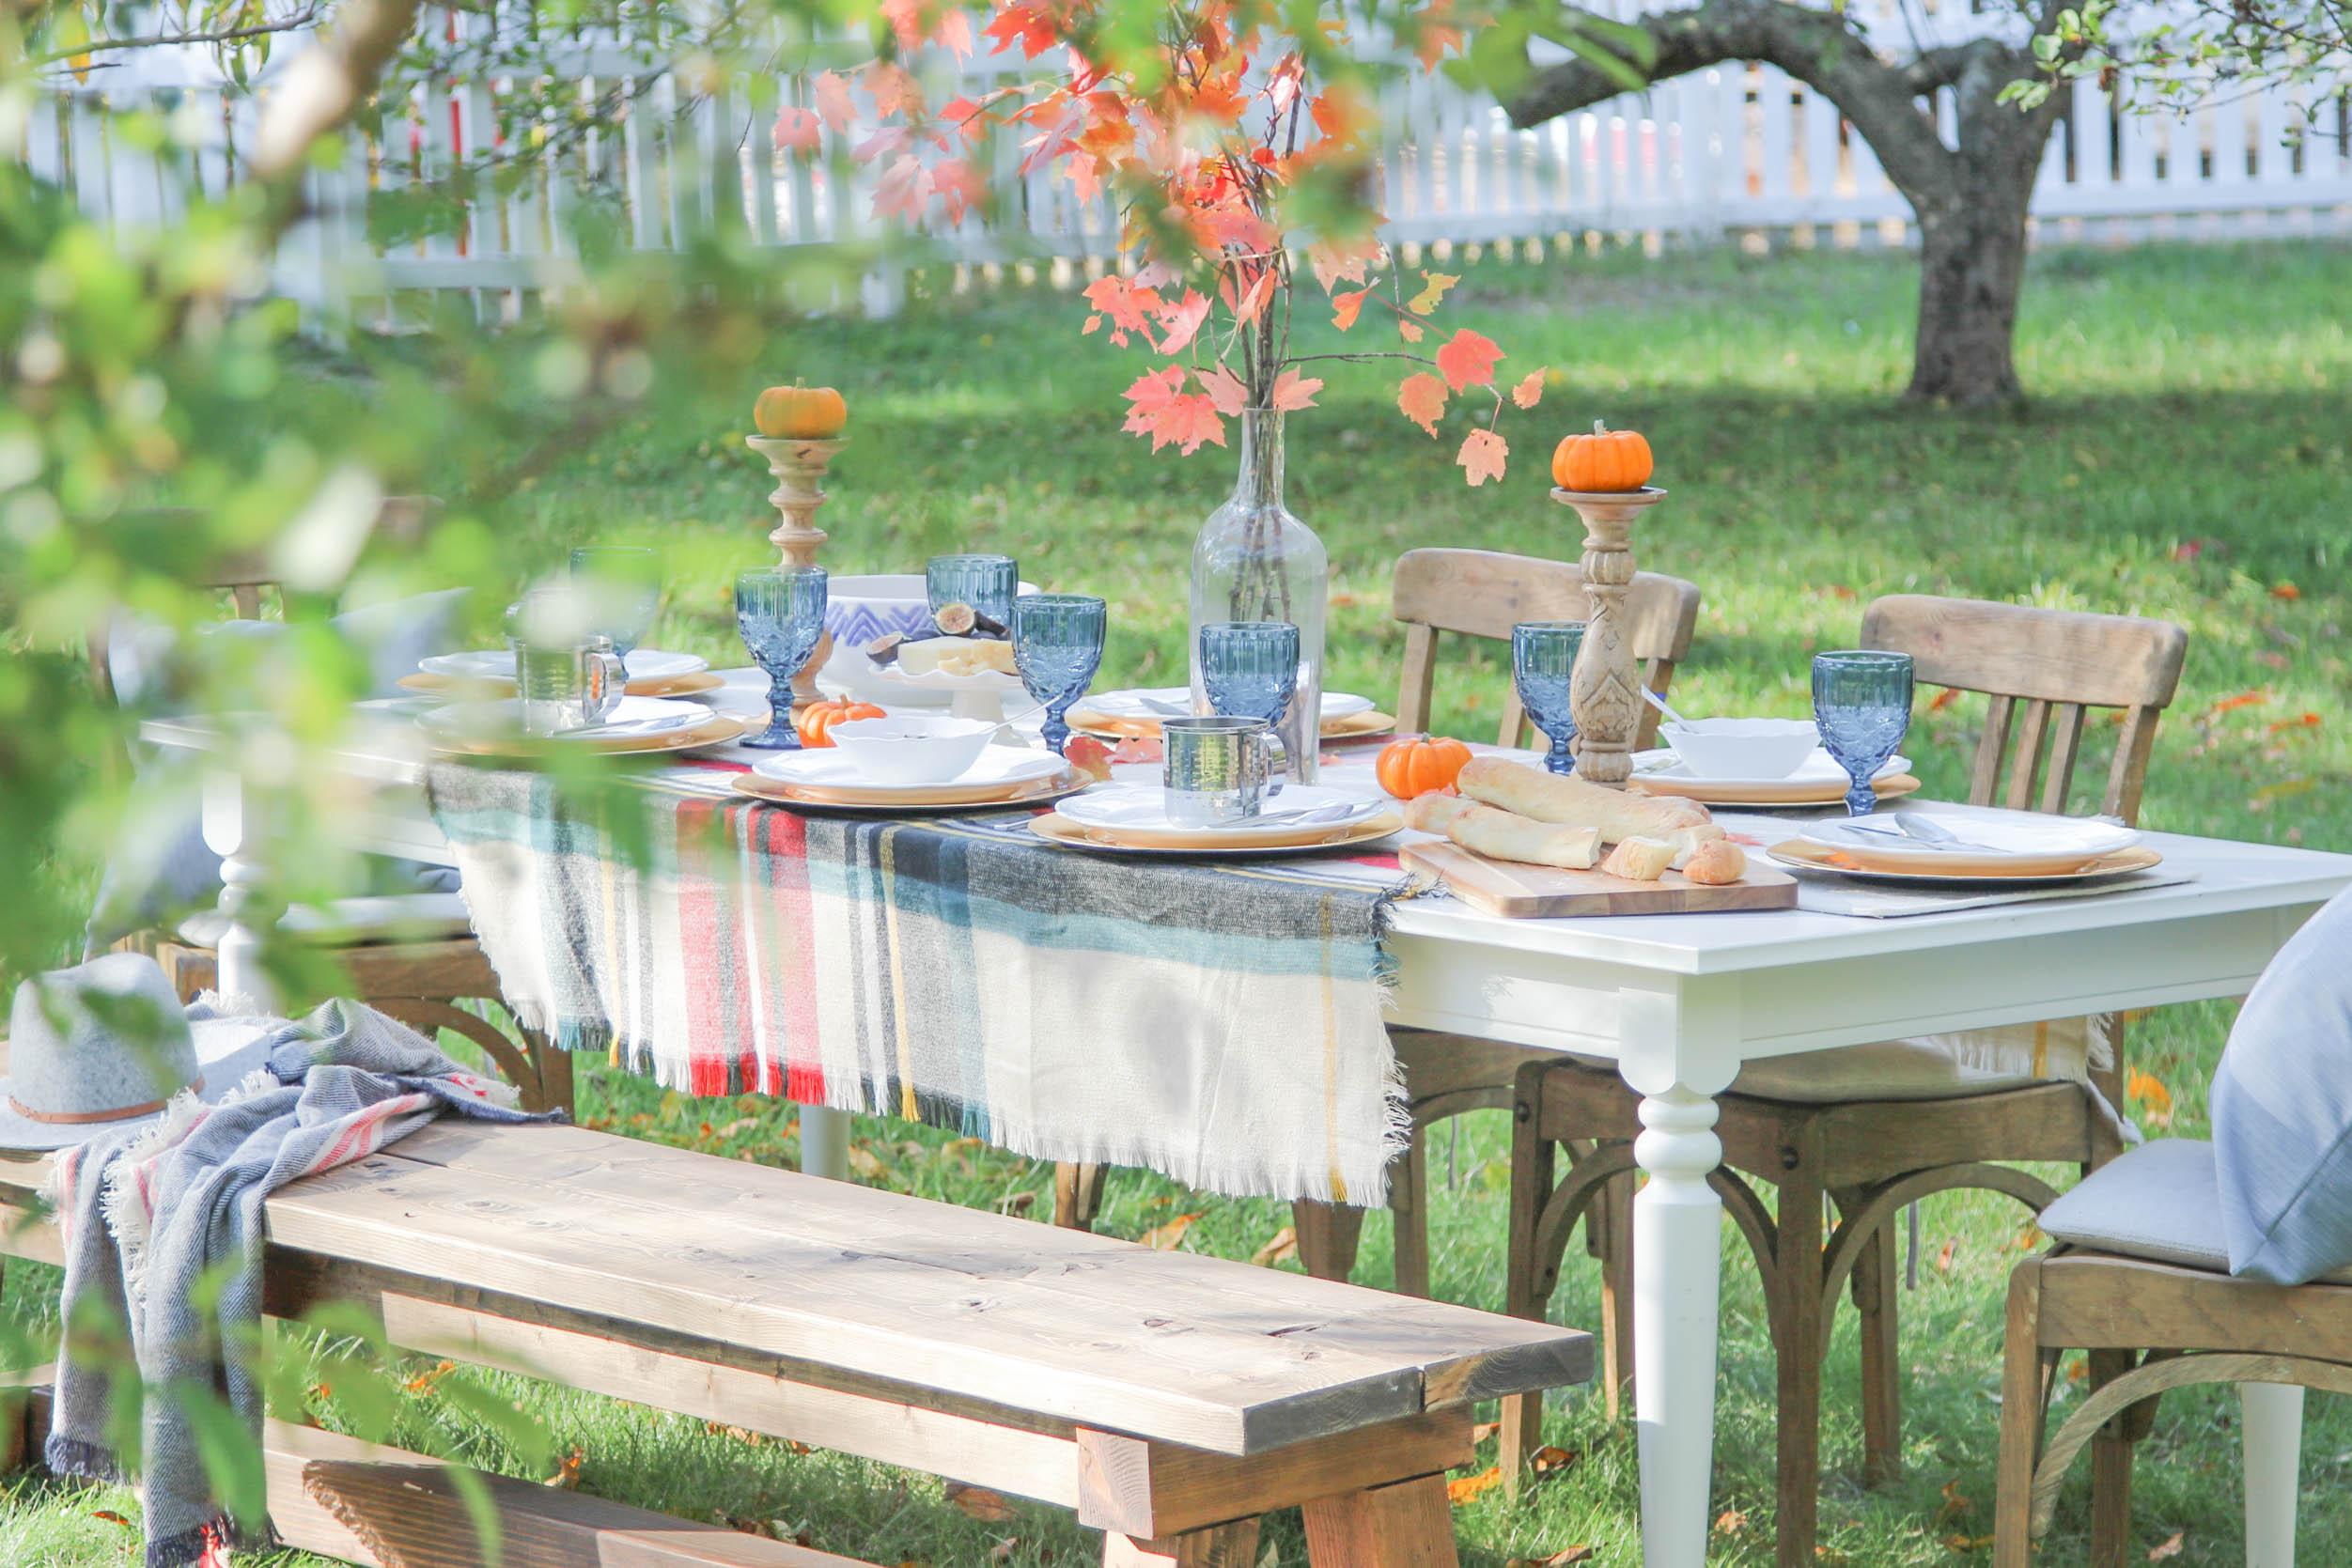 cozy autumn table